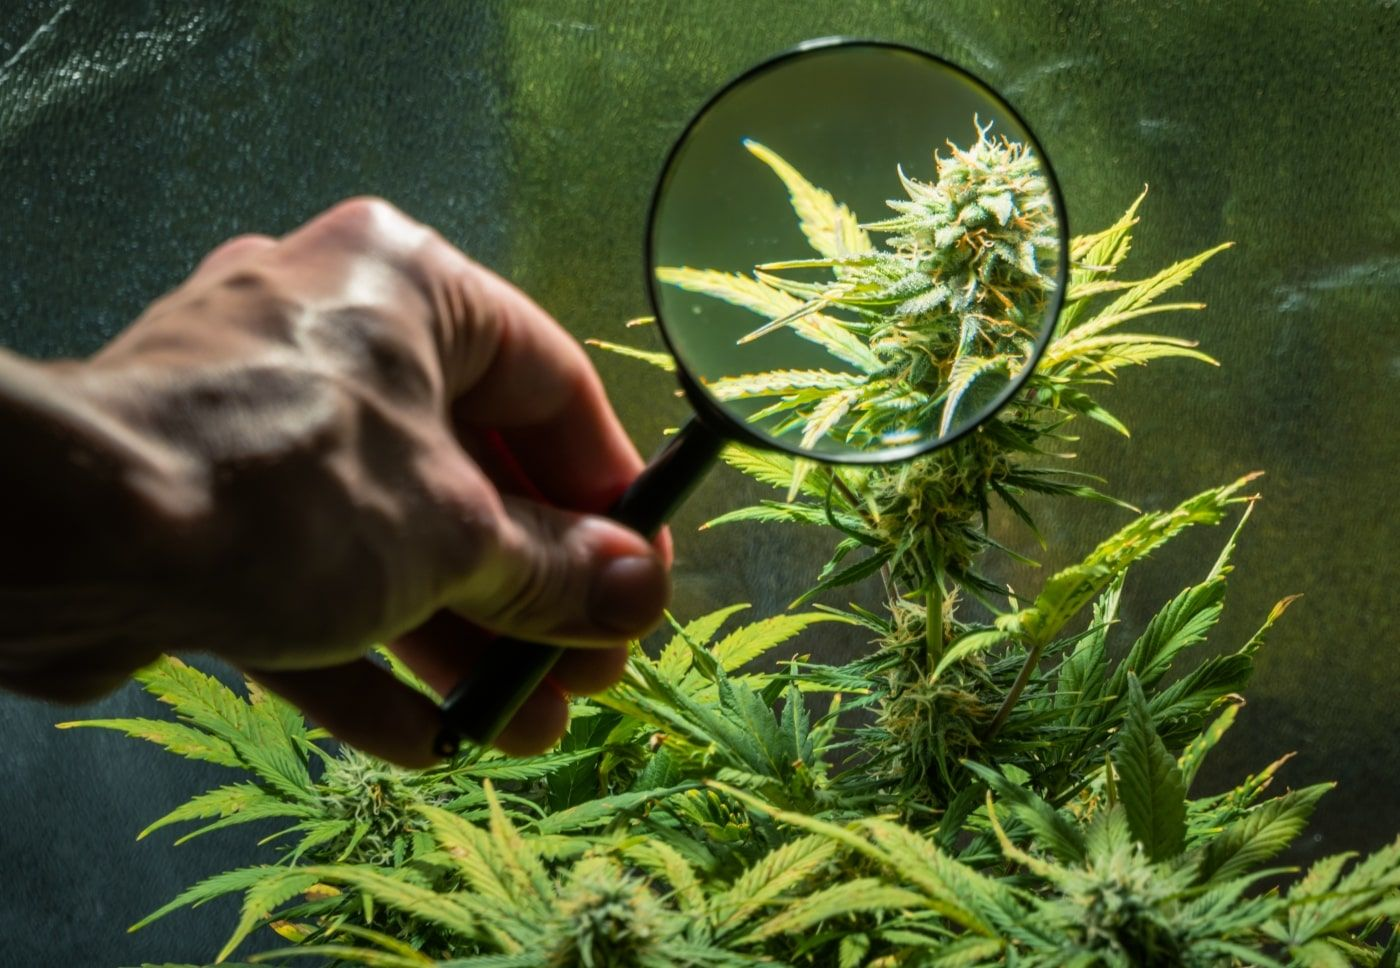 Michigan wholesale marijuana, Michigan wholesale medical marijuana prices fall on flood of caregiver product